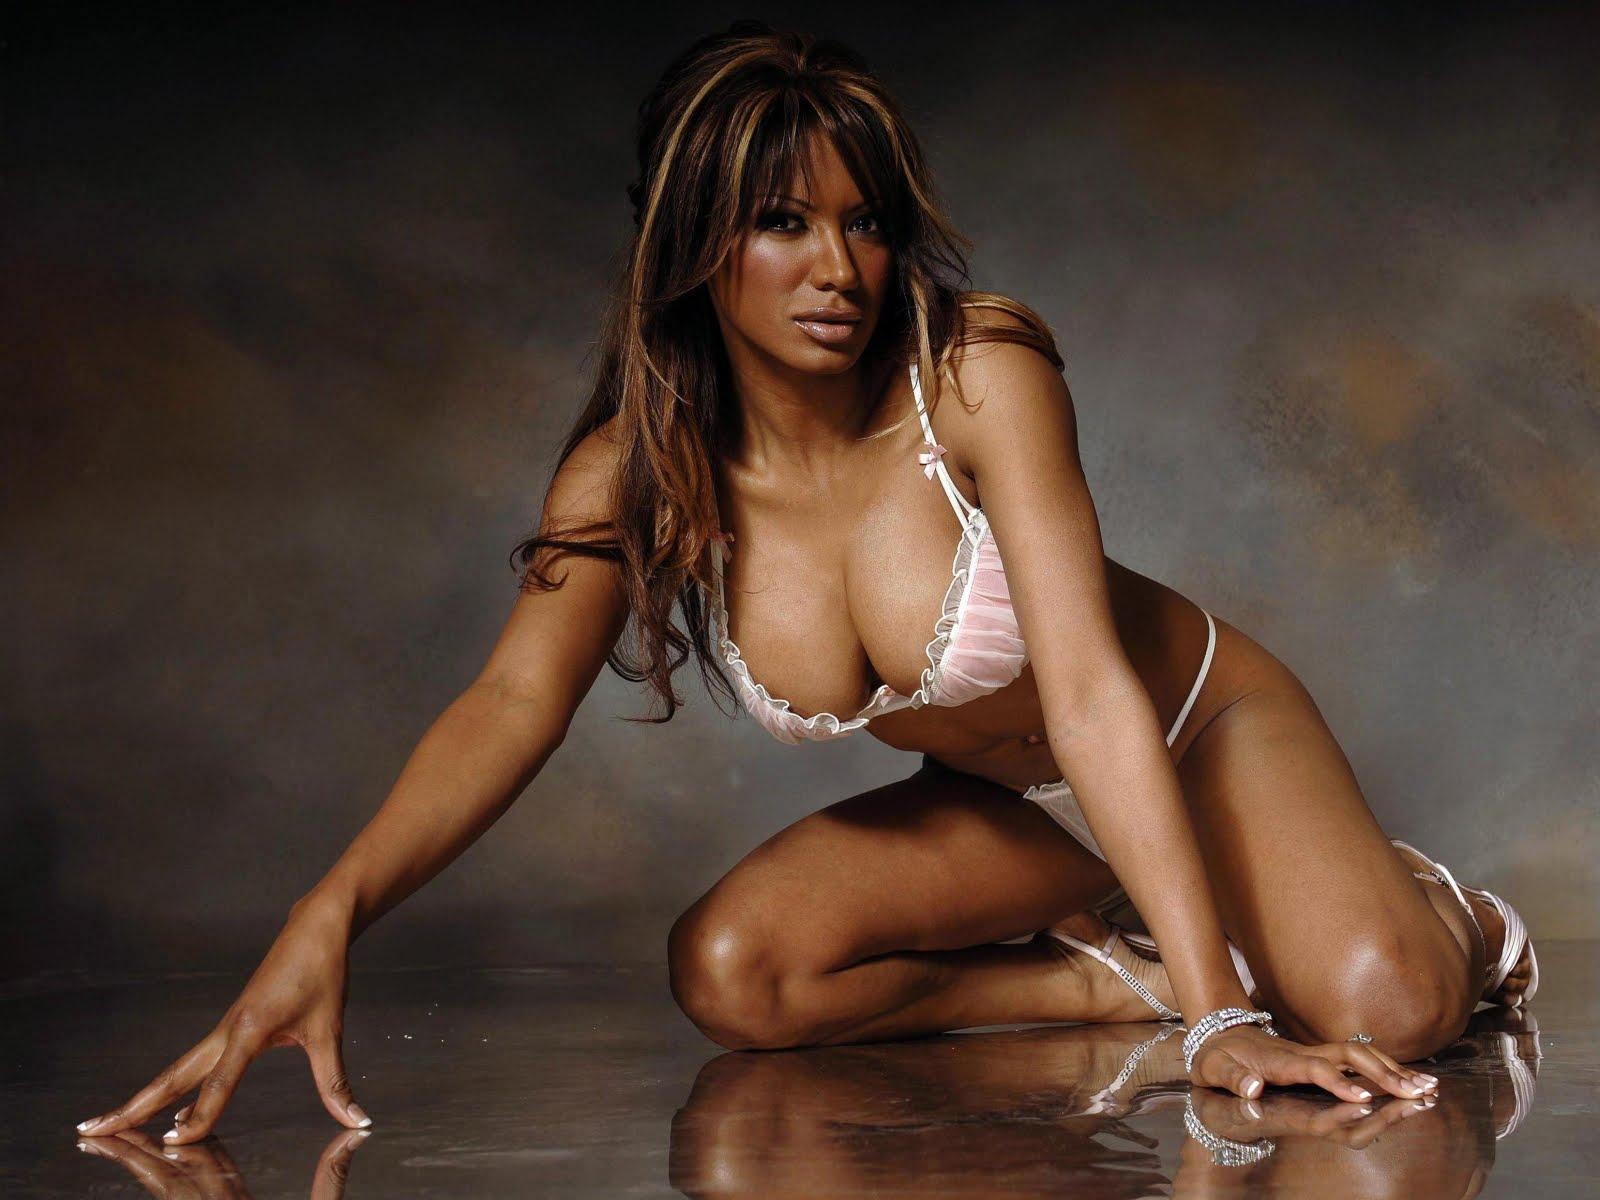 FunCruiser-The Sexy Babes Gallery!: Sexy Traci Bingham HQ Bikini ...